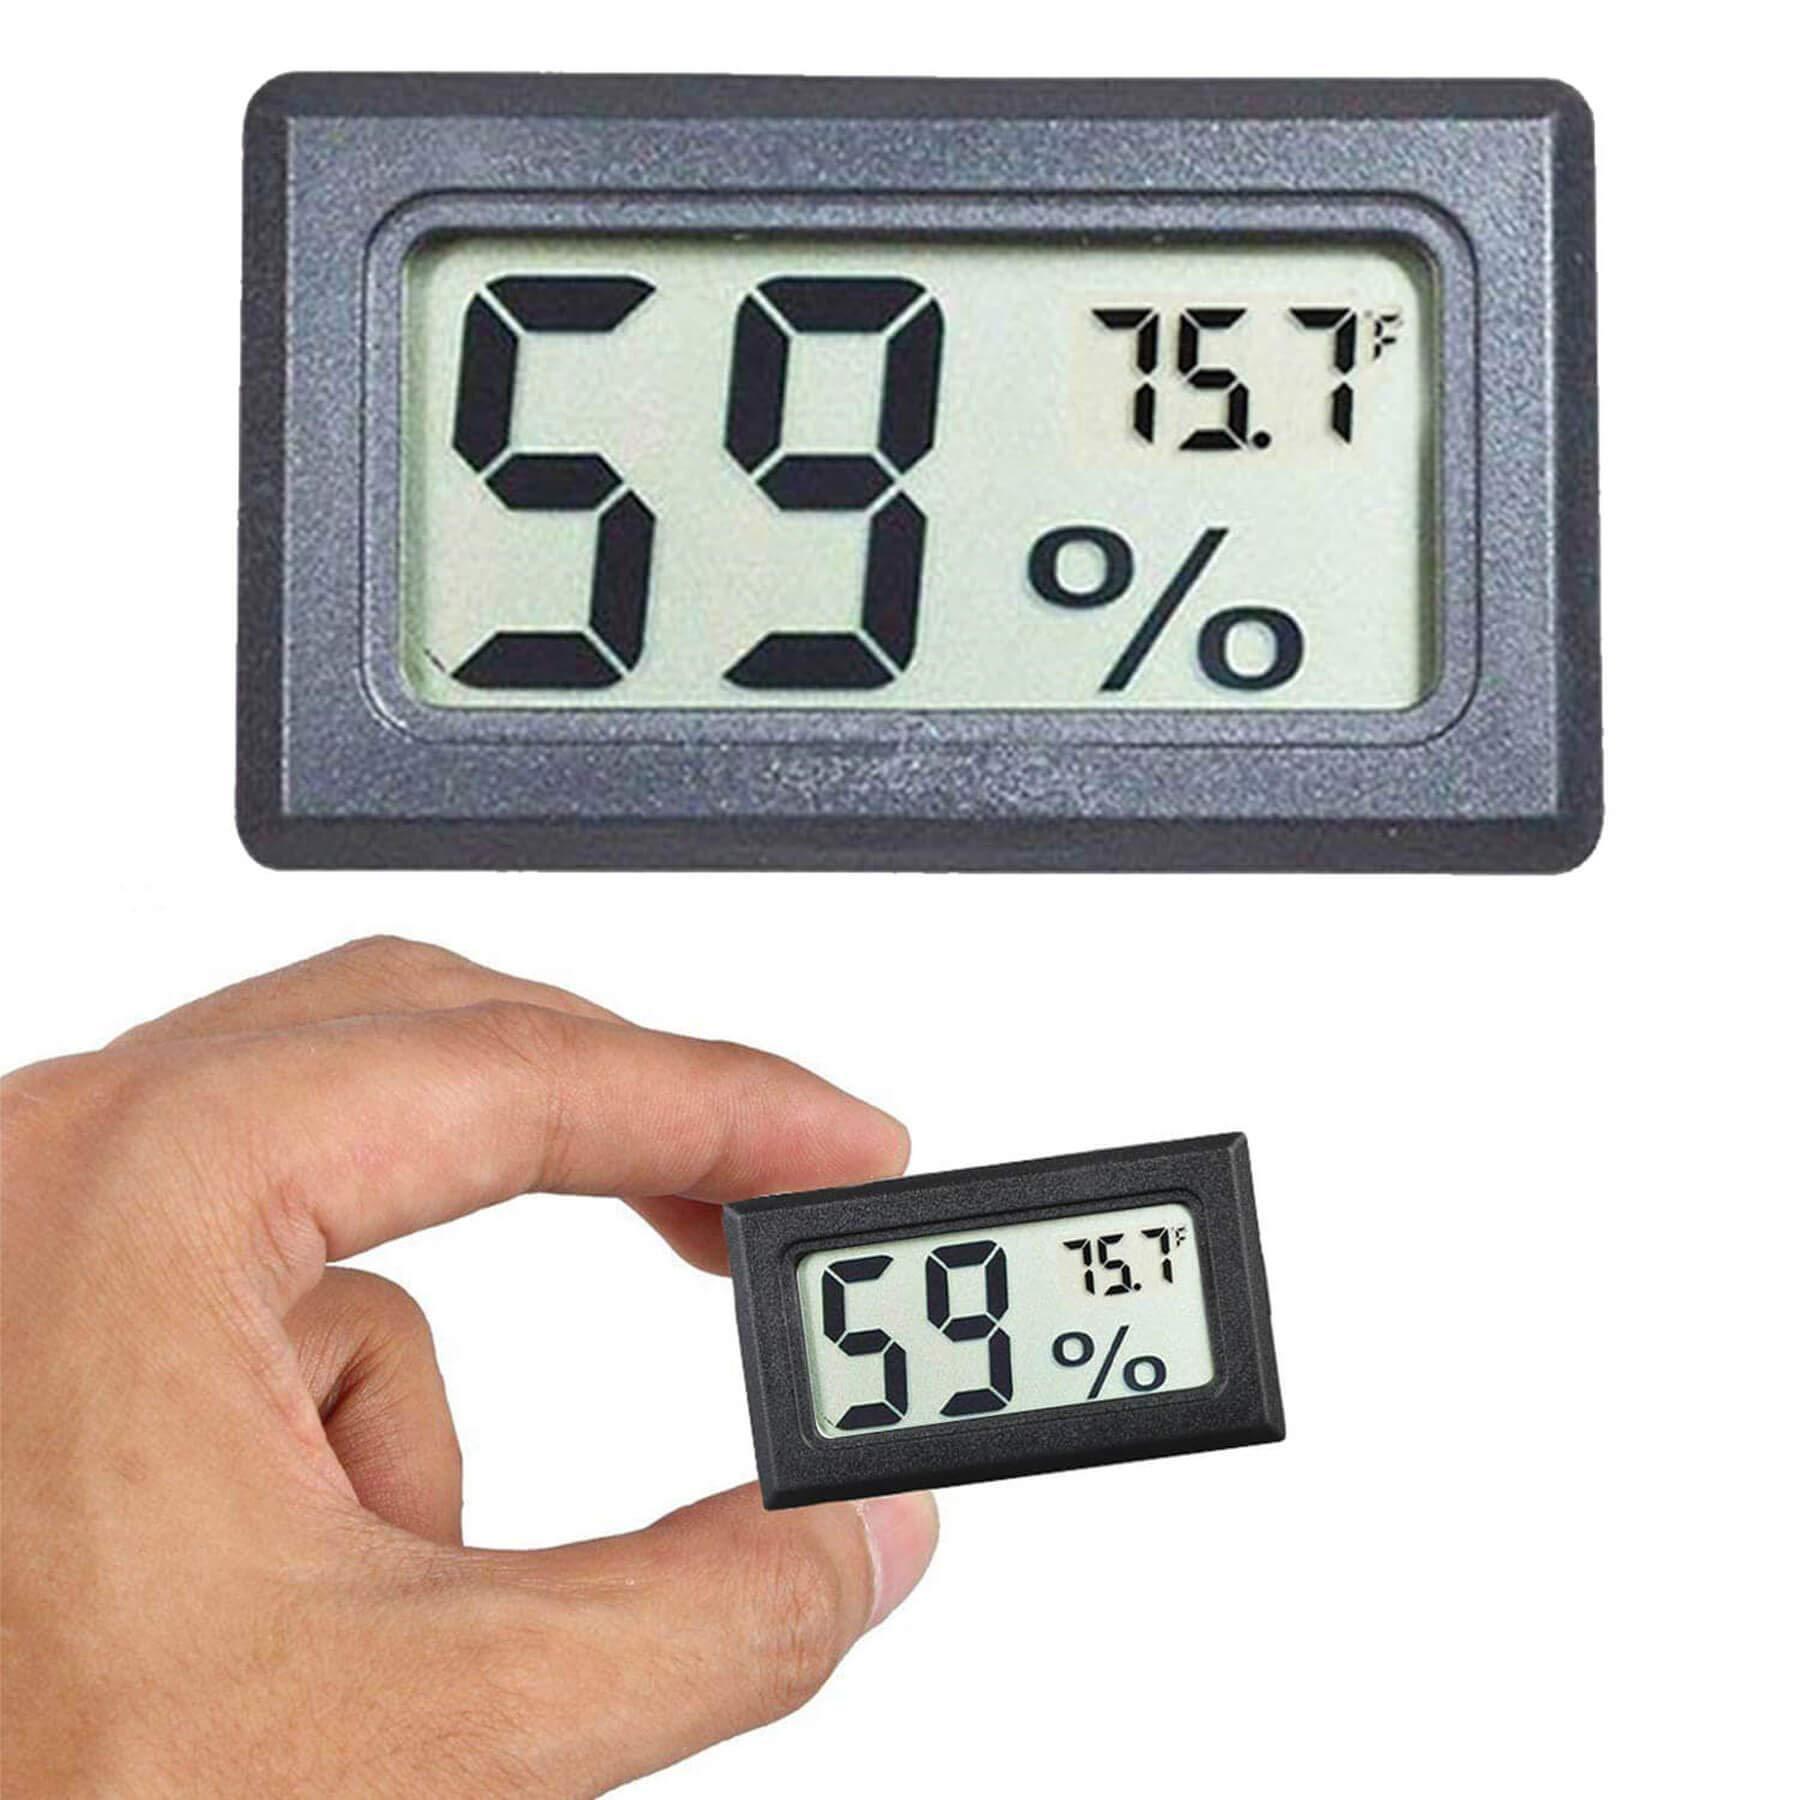 Goabroa Mini Hygrometer Thermometer Digital Indoor Humidity Gauge Monitor with Temperature Meter Sensor Fahrenheit (℉)